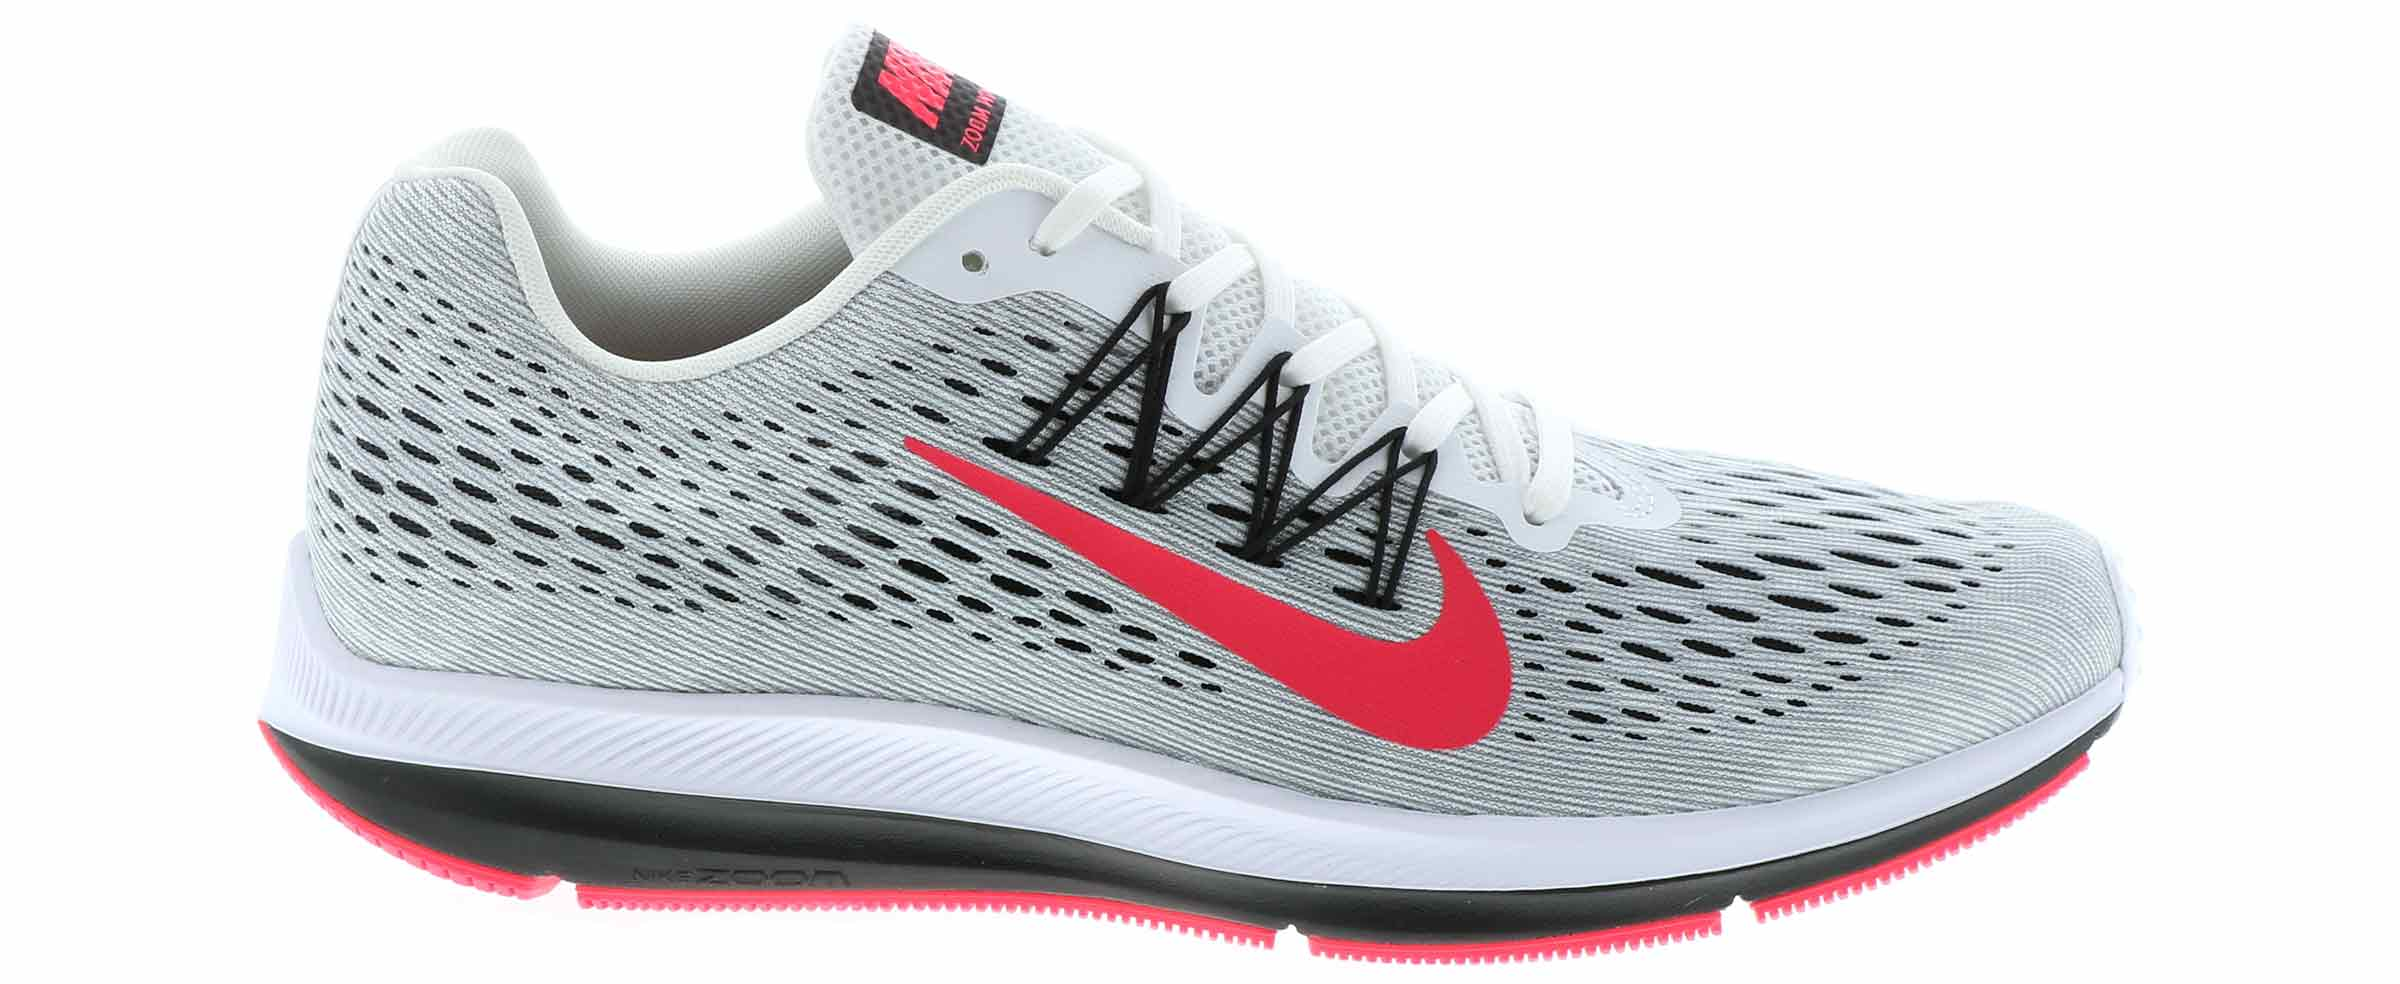 sale retailer d6f38 0a666 Men's Nike Air Zoom Winflo 5